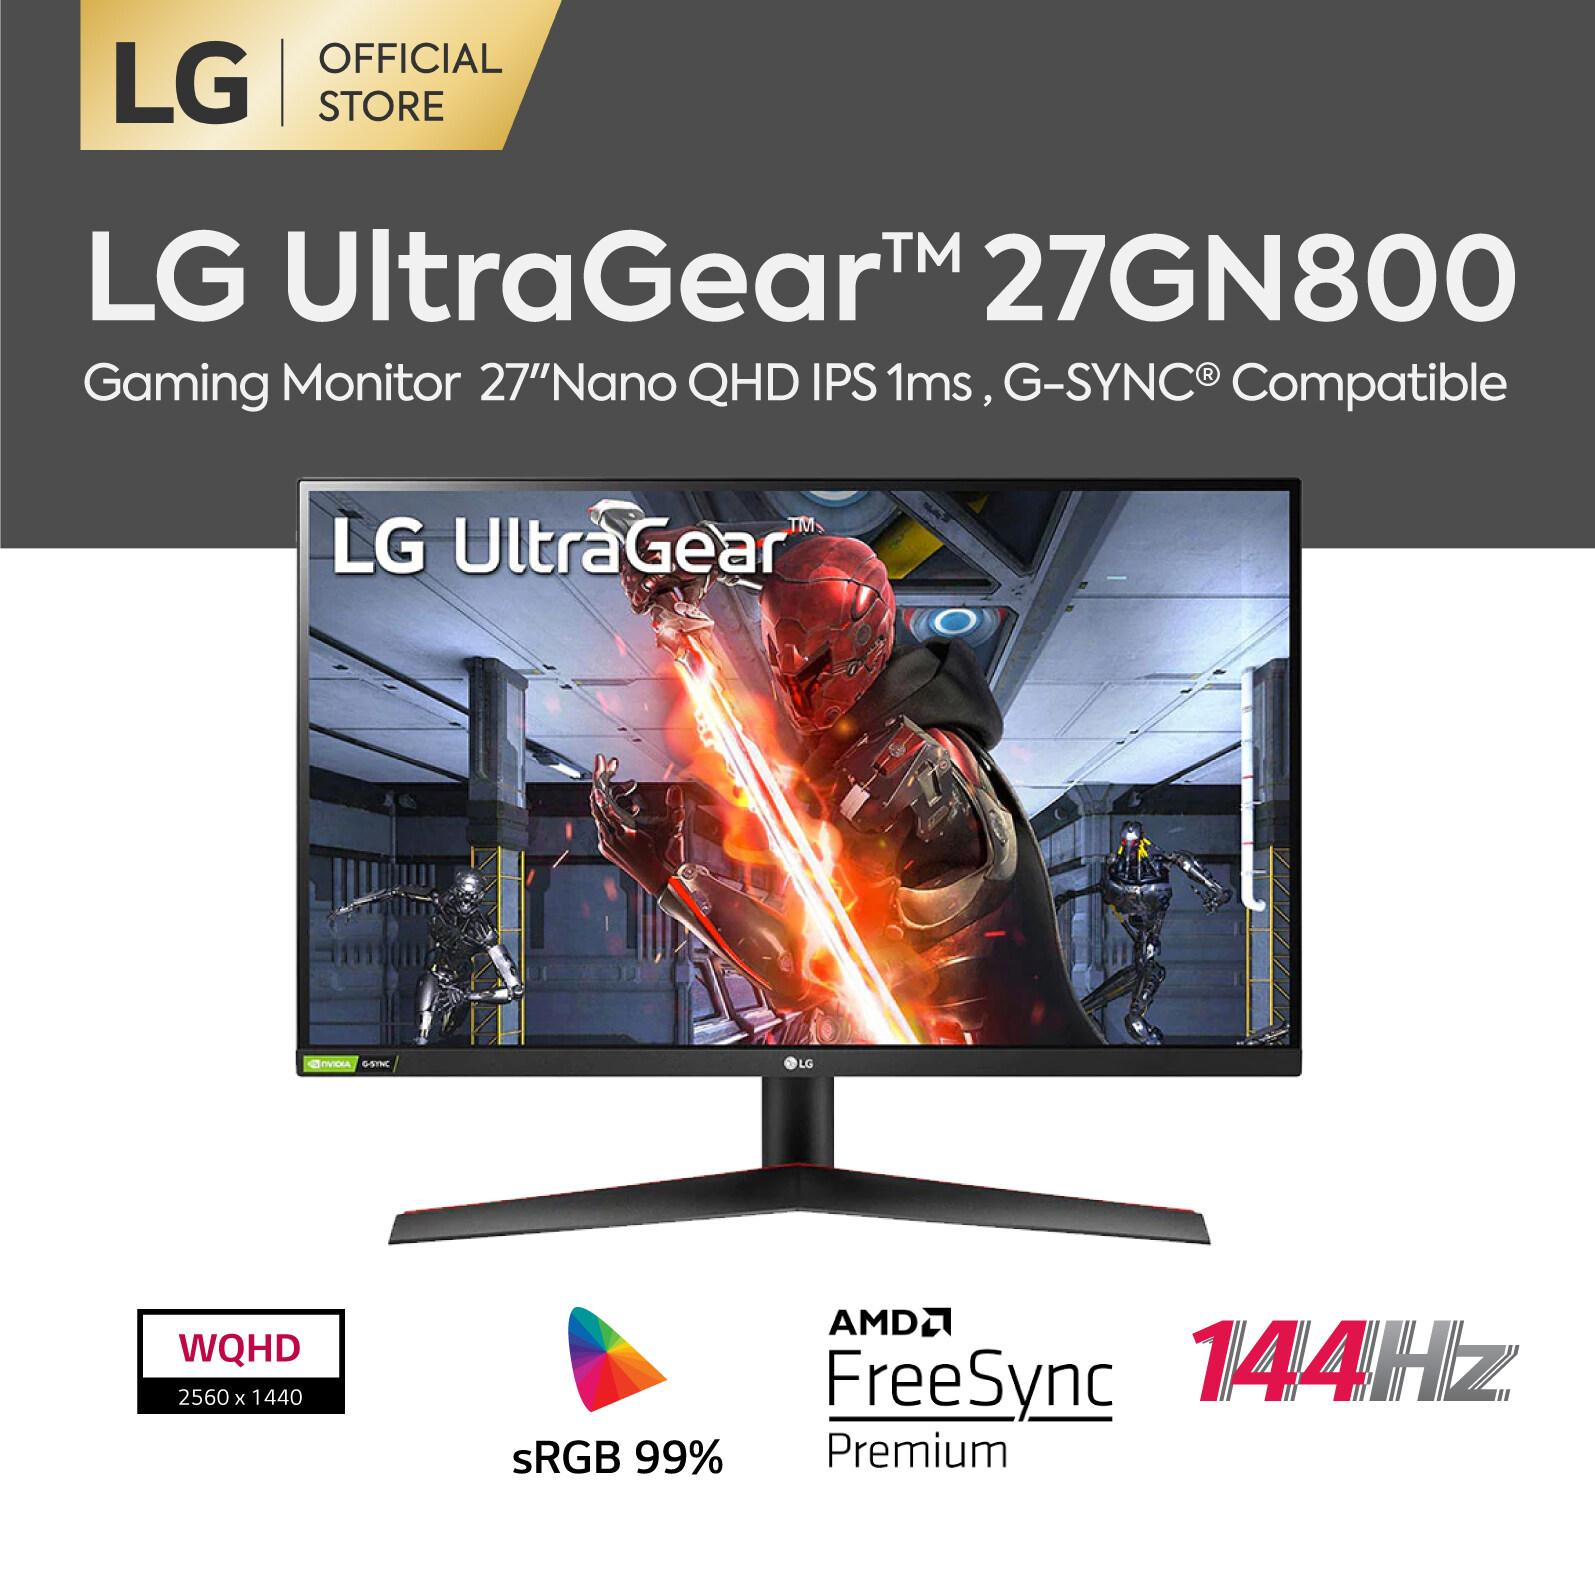 Lg จอมอนิเตอร์ 27 นิ้ว 27gn800 ความละเอียด Qhd (2560 X 1440) Ips 1 Ms, 144hz, Hdr10 With G-Sync Compatible, Amd Freesync™ Premium (จอคอมพิวเตอร์).